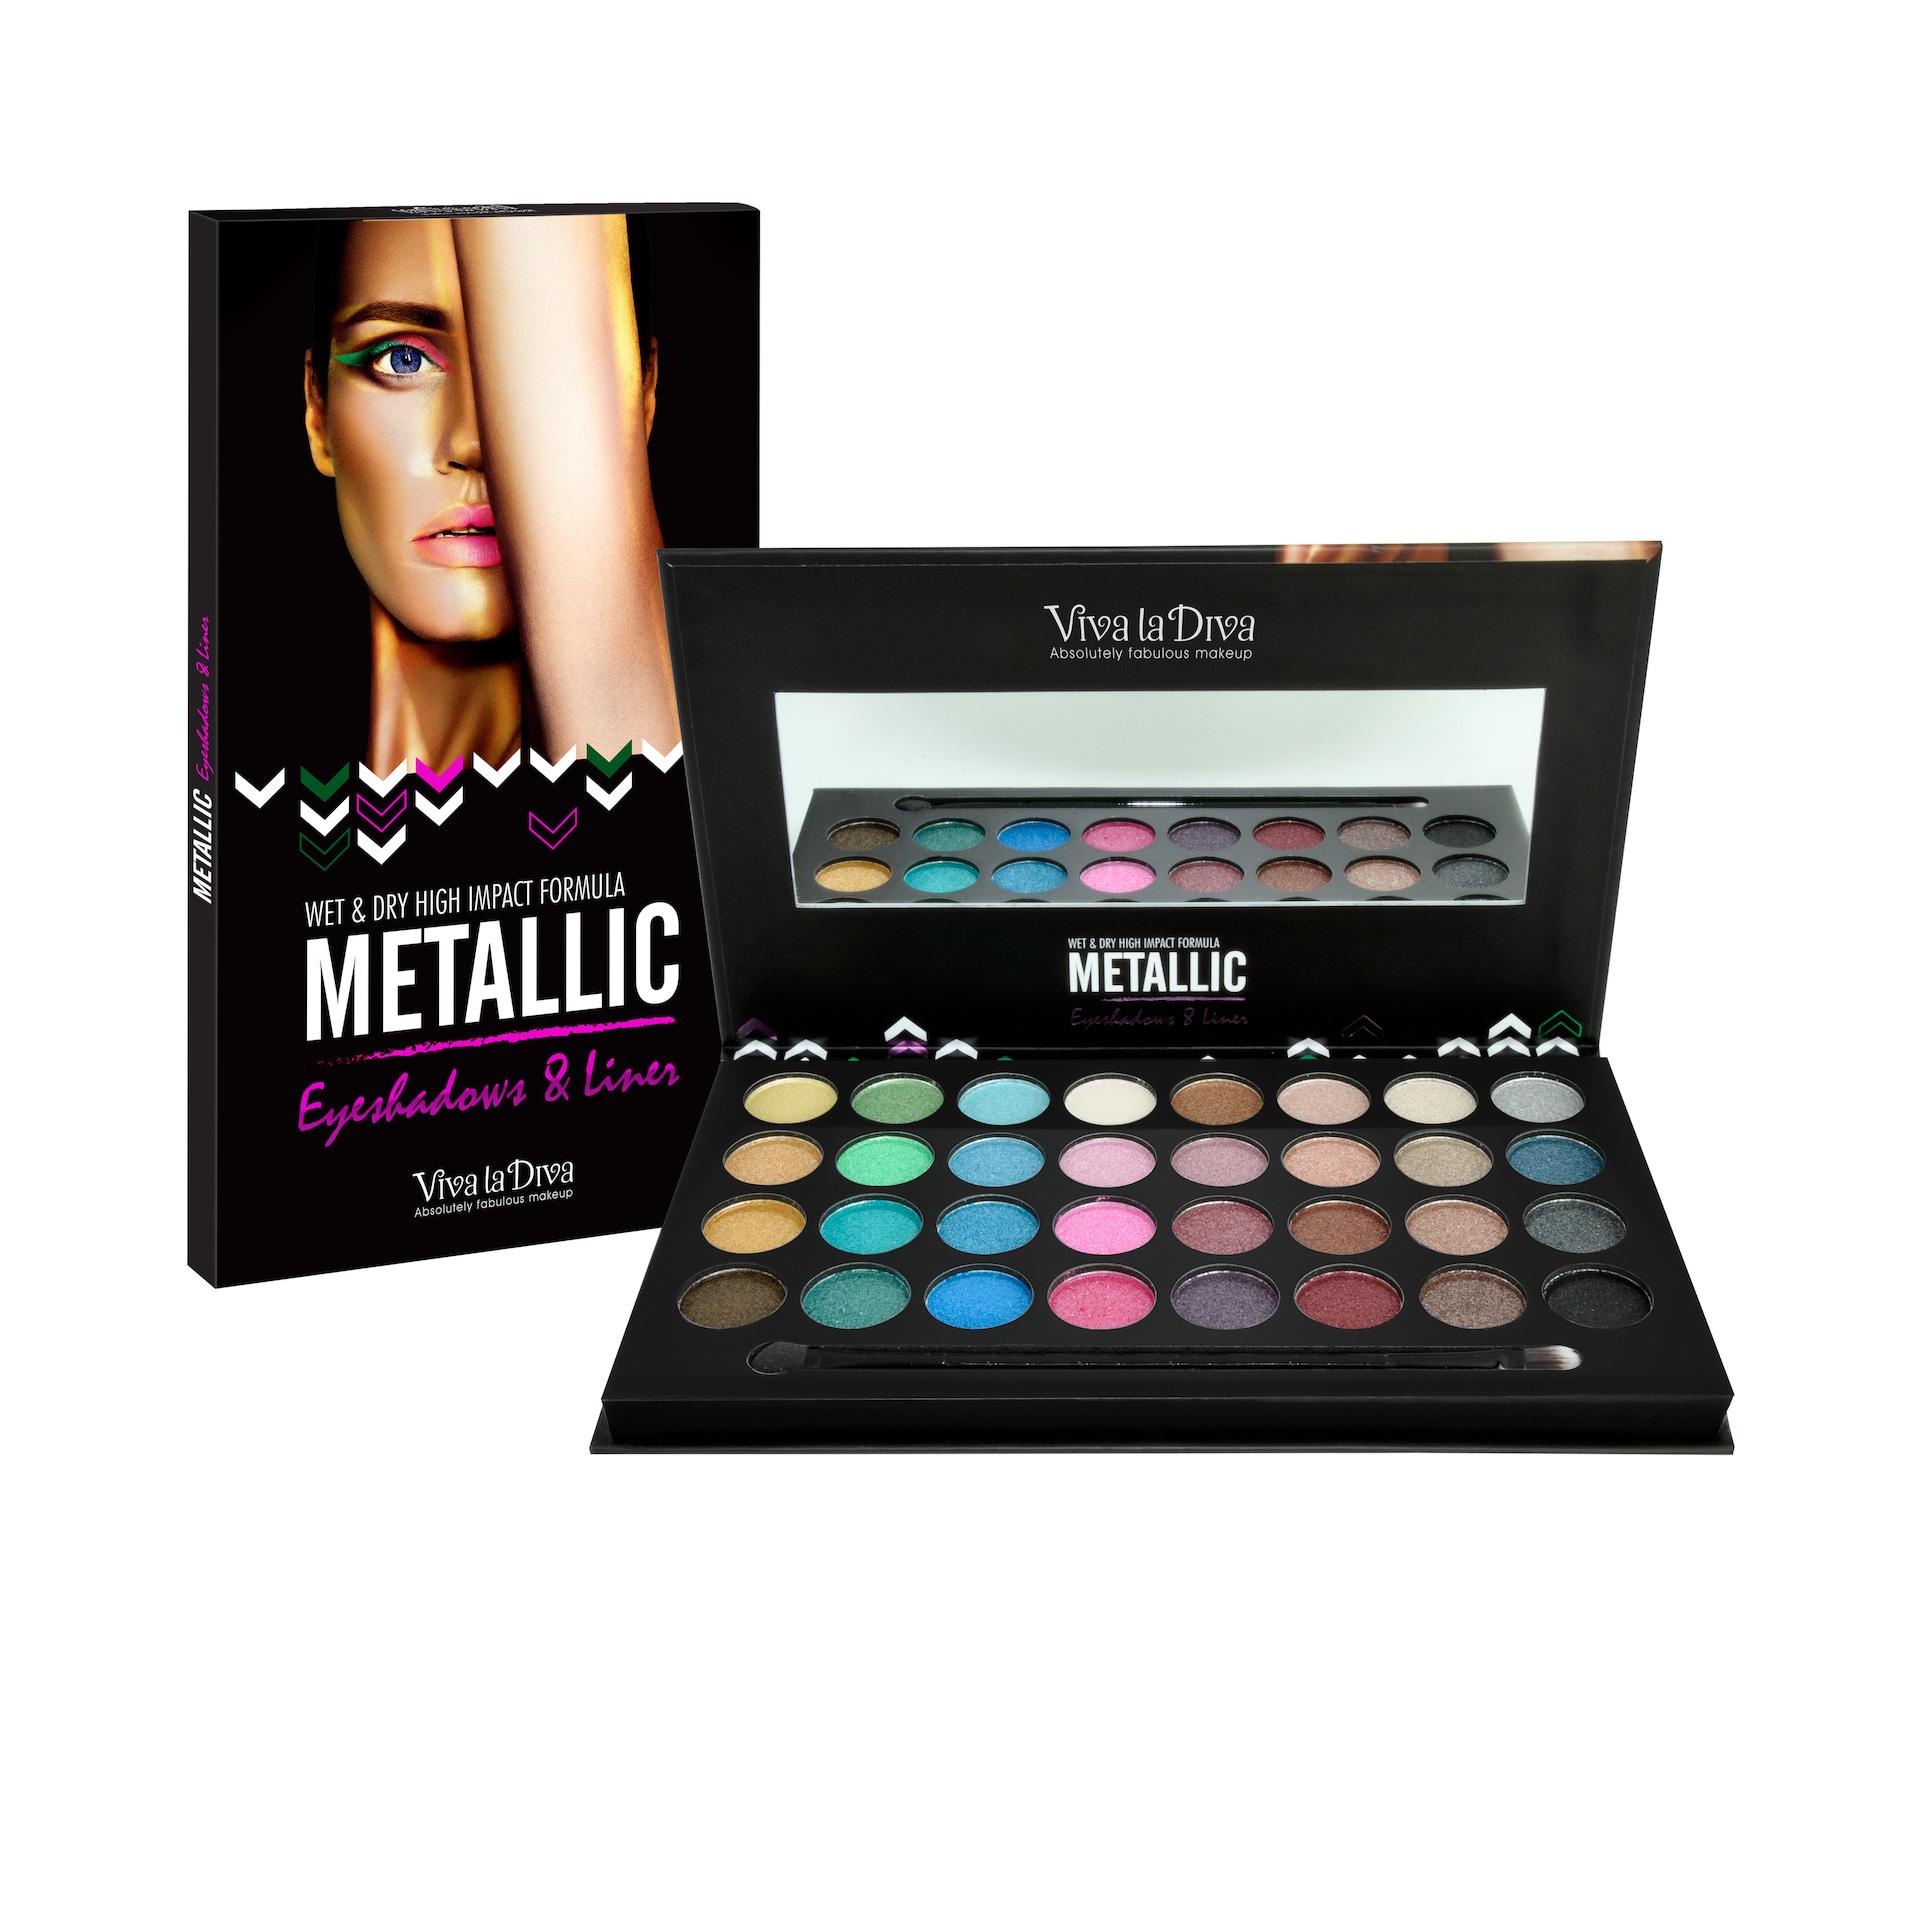 Metallic Eyeshadows & Liner